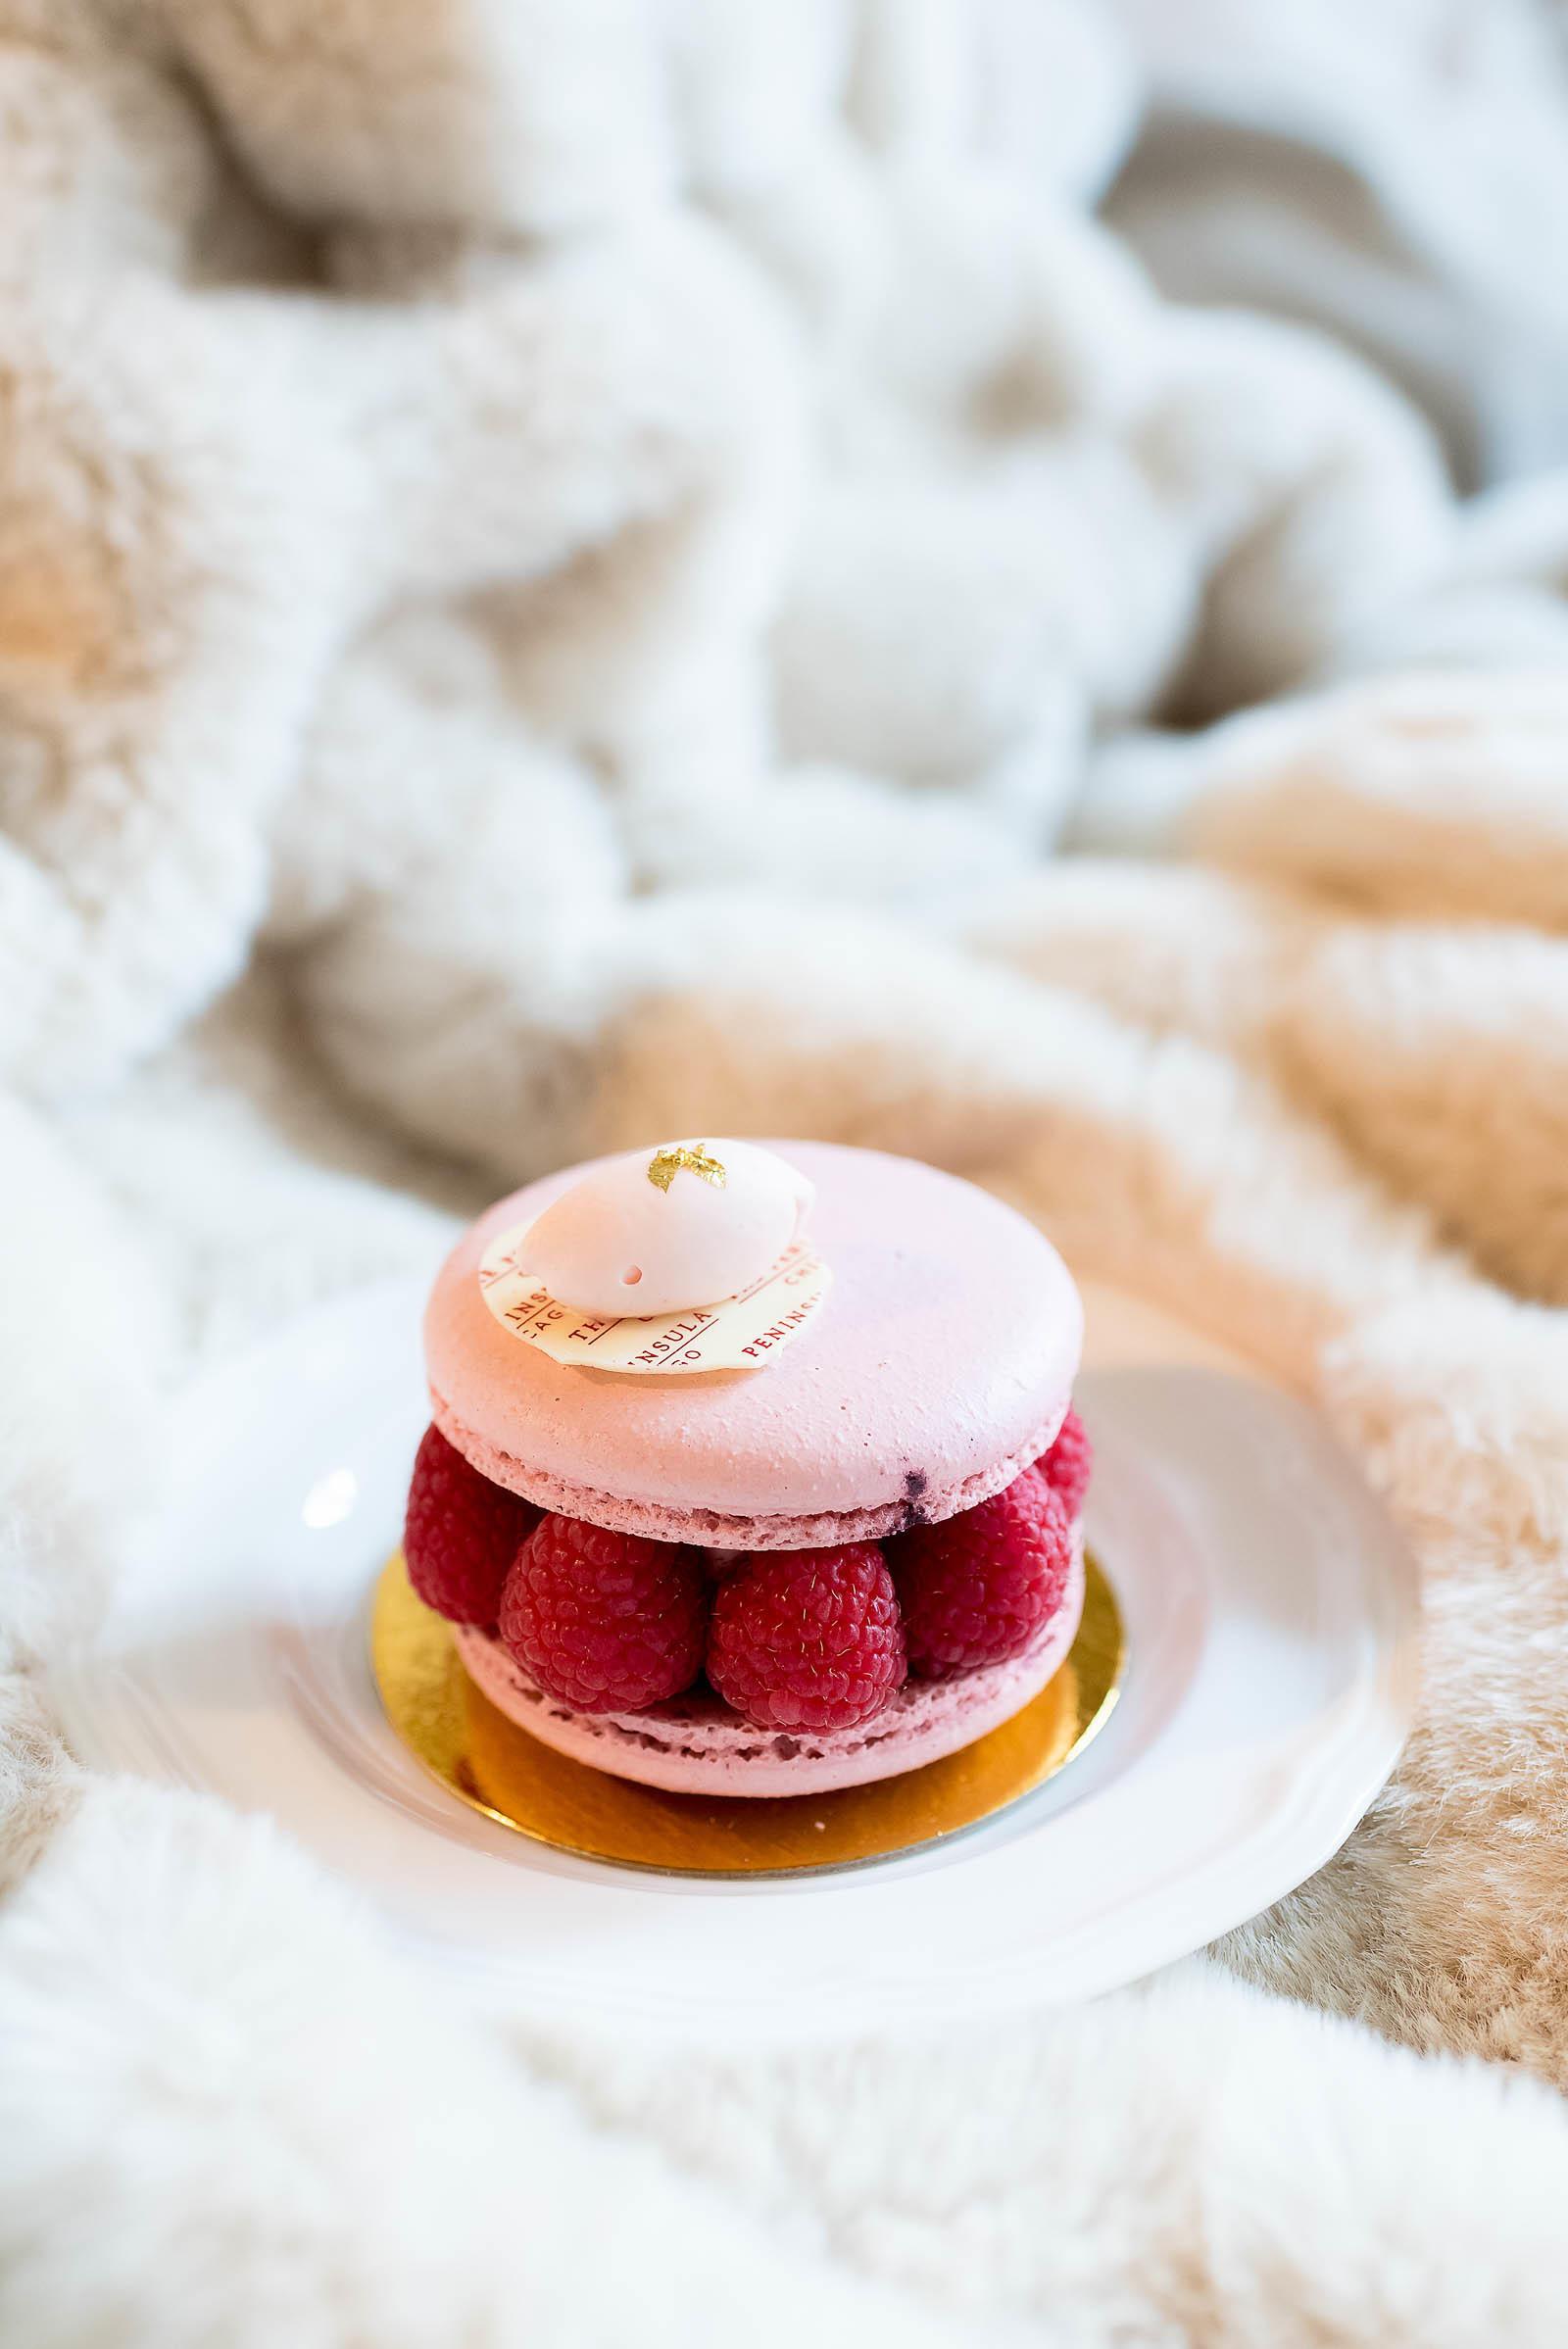 Peninsula Chicago Pierrot Gourmet Raspberry Macaron Sandwich